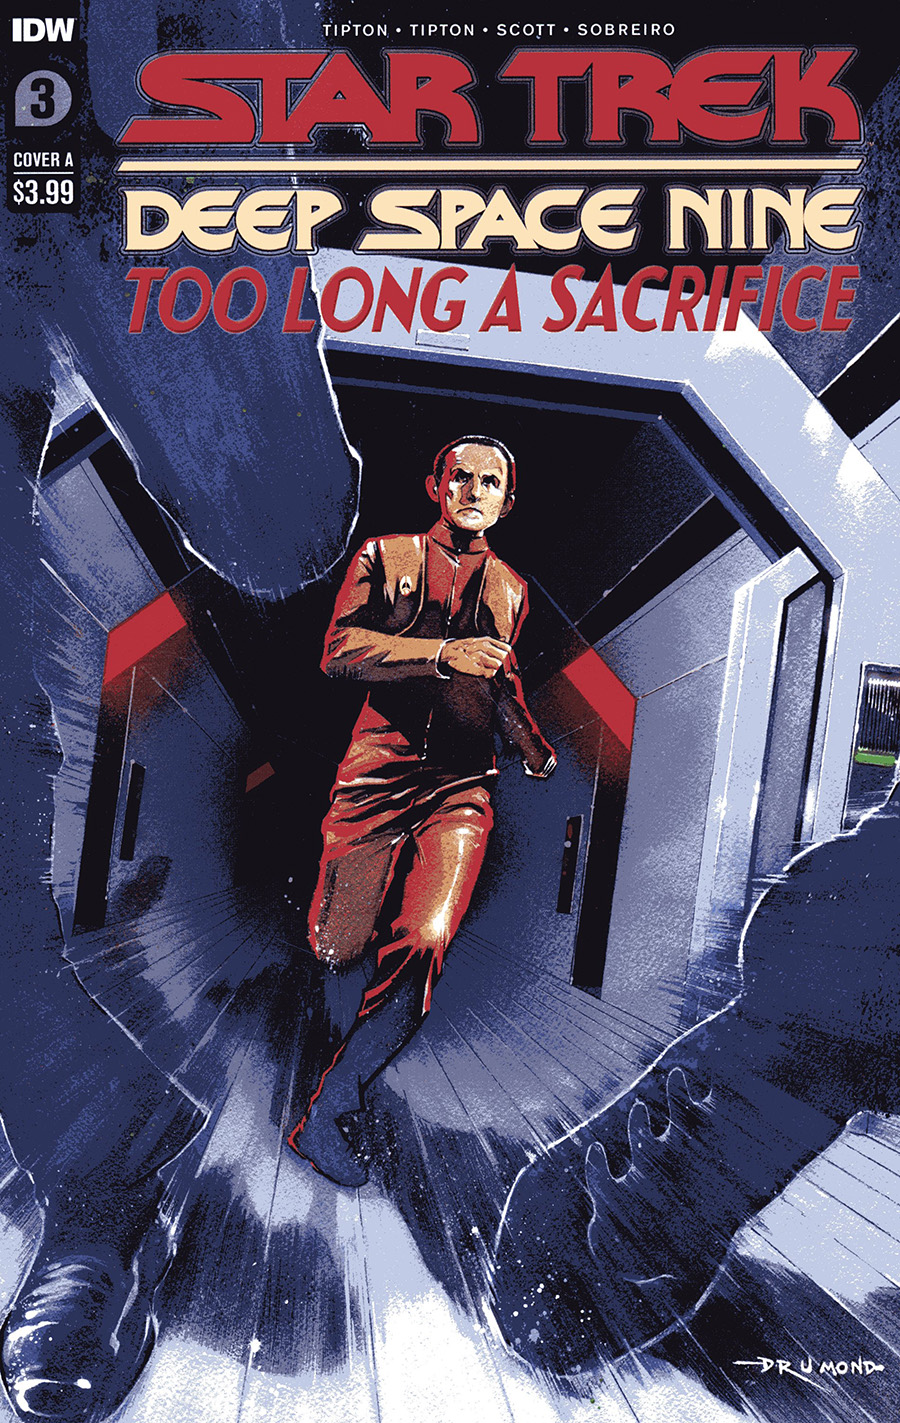 Star Trek: Deep Space Nine - Too Long A Sacrifice #3 (2020)